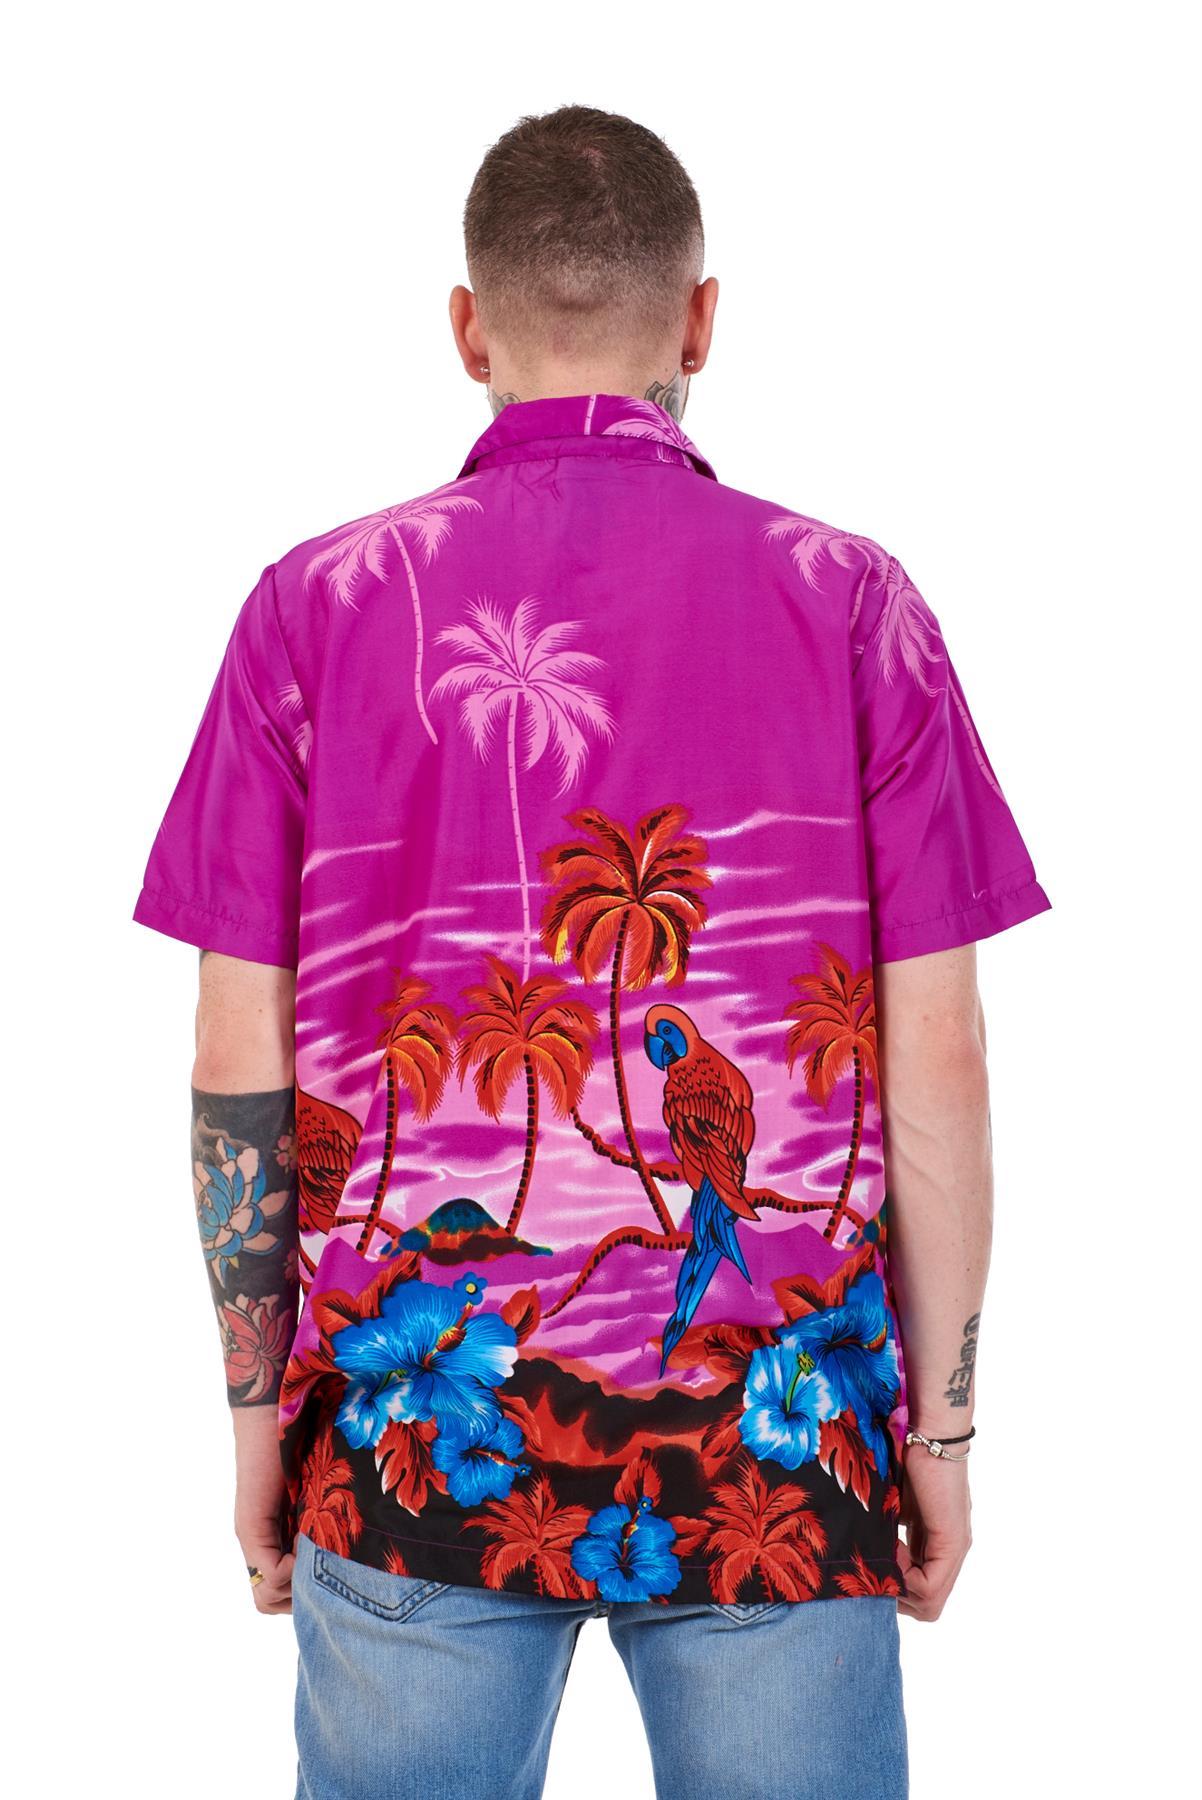 Mens-Hawaiian-Shirt-Multi-Colors-Print-Regular-Big-Size-Summer-Fancy-Dress-M-5XL thumbnail 32